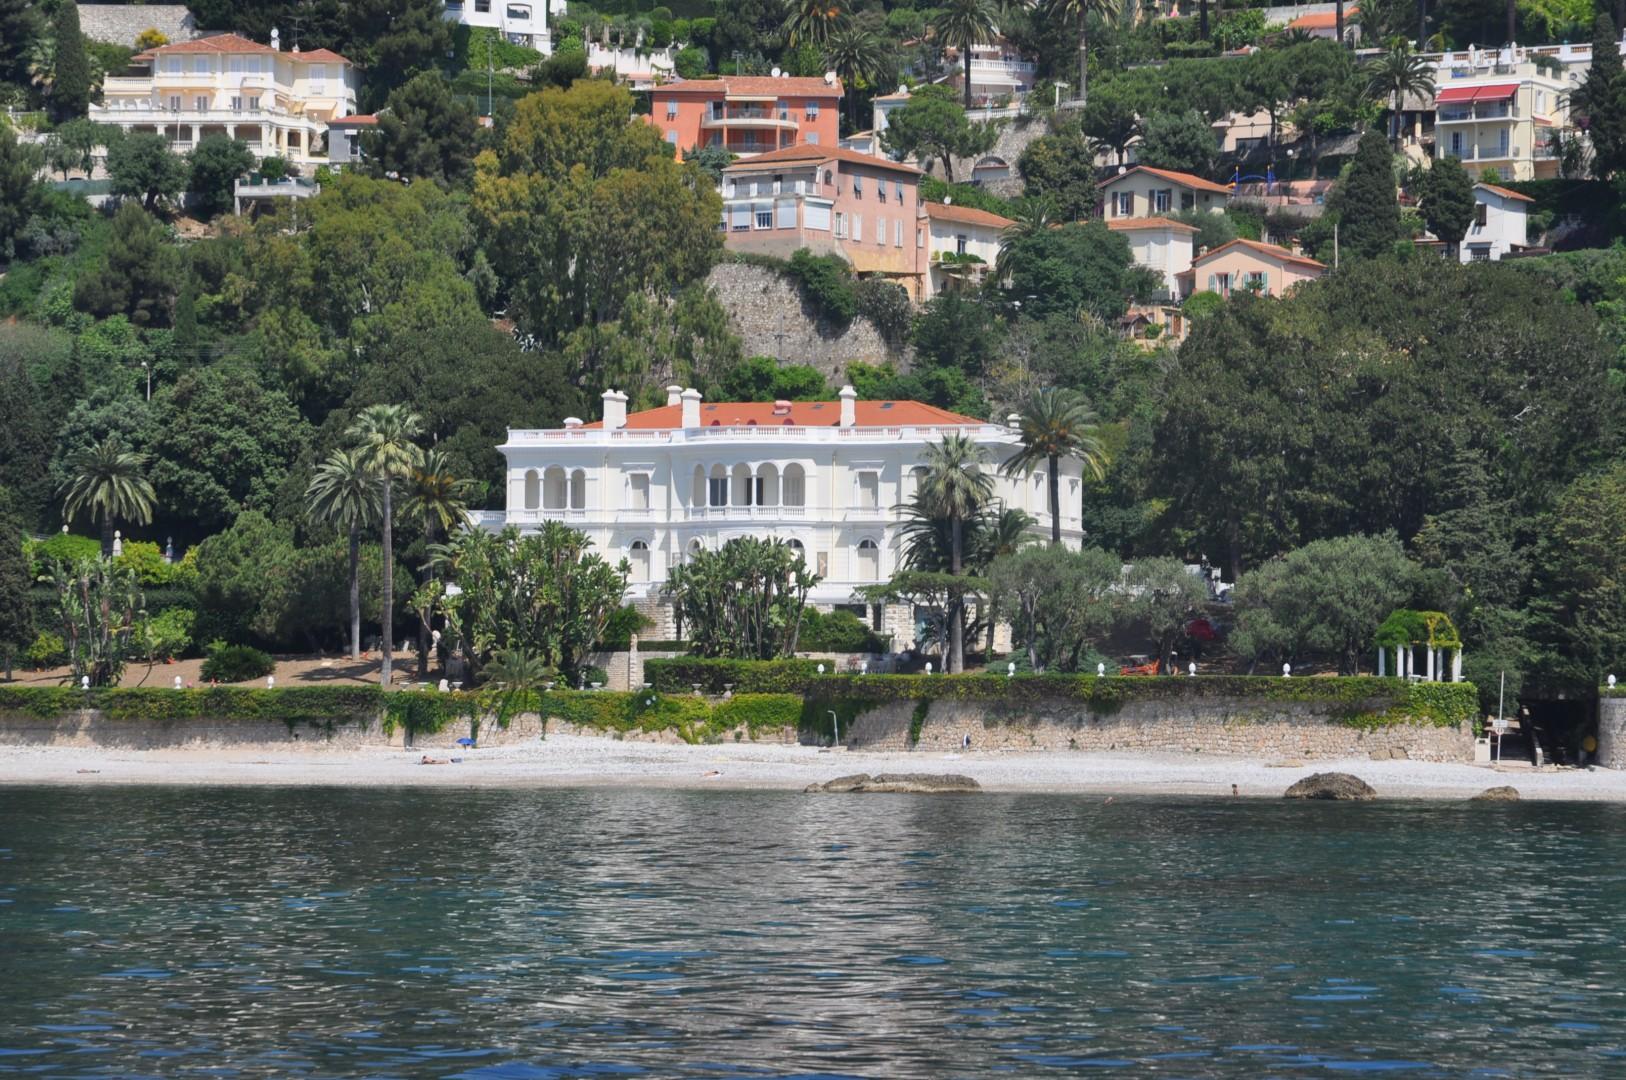 Casa del Mare